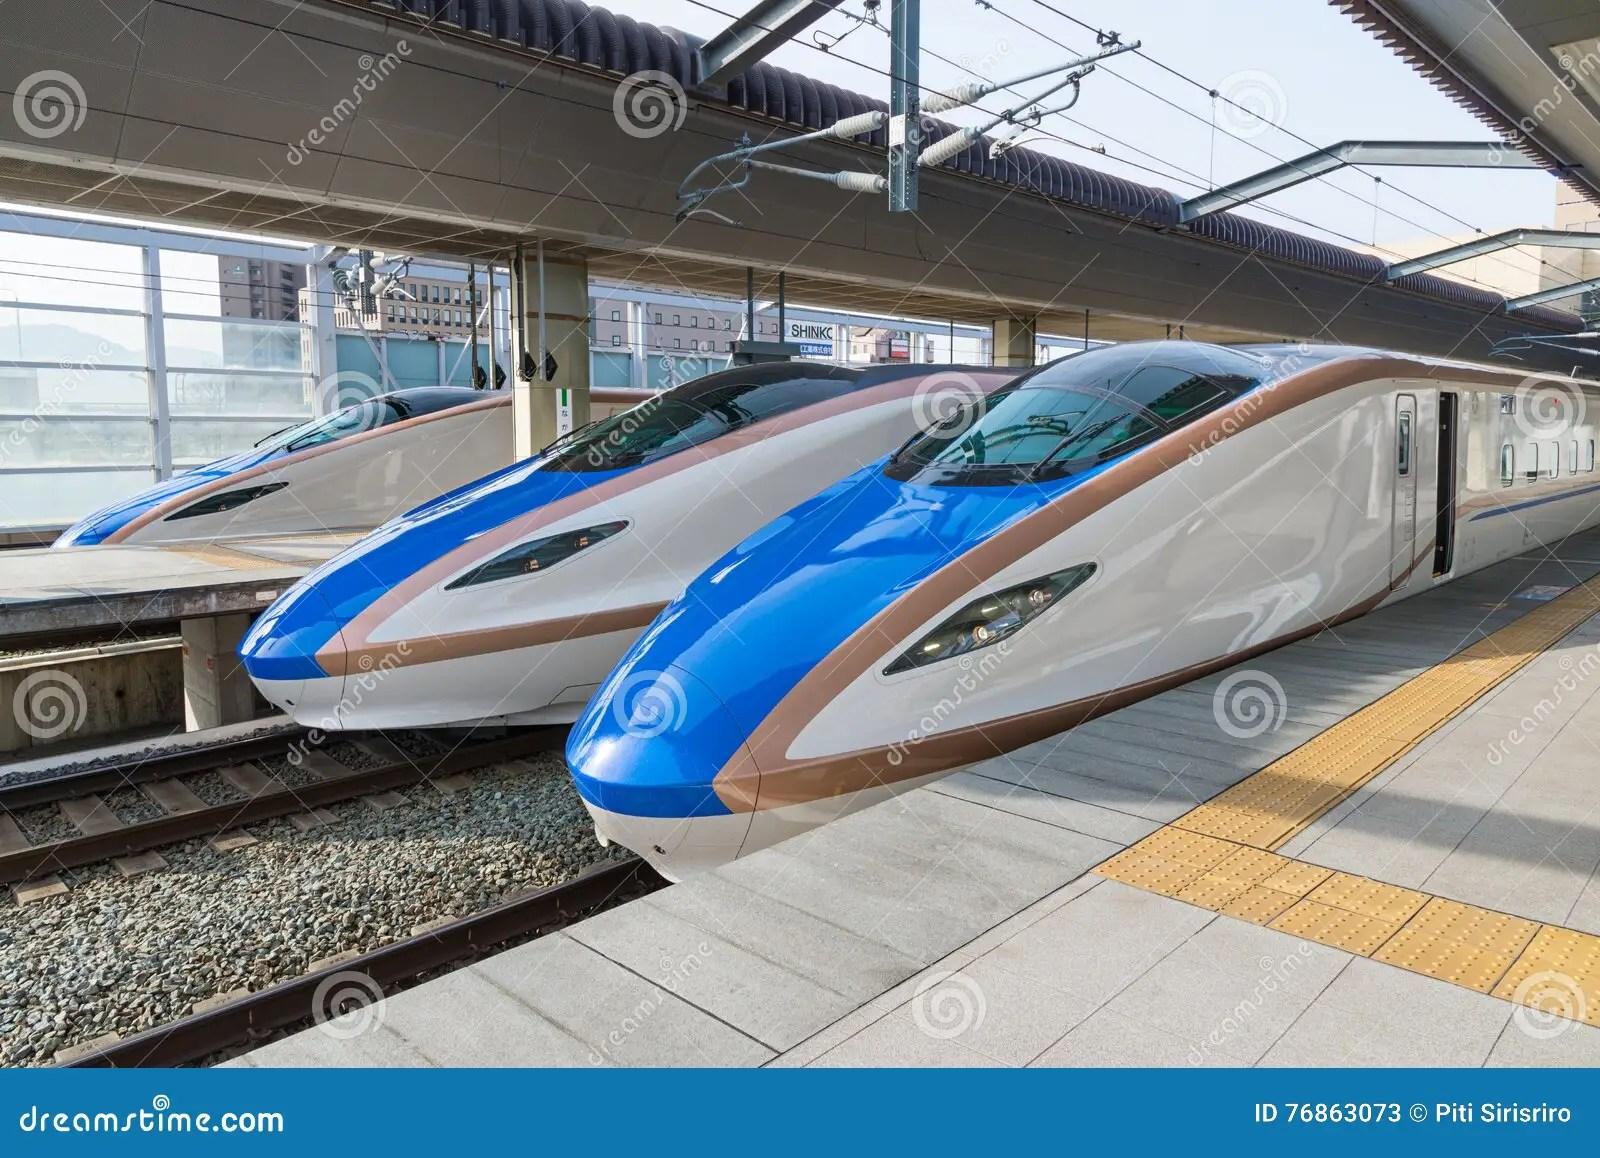 E7 W7 Series Bullet High Speed Or Shinkansen Trains Editorial Stock Photo